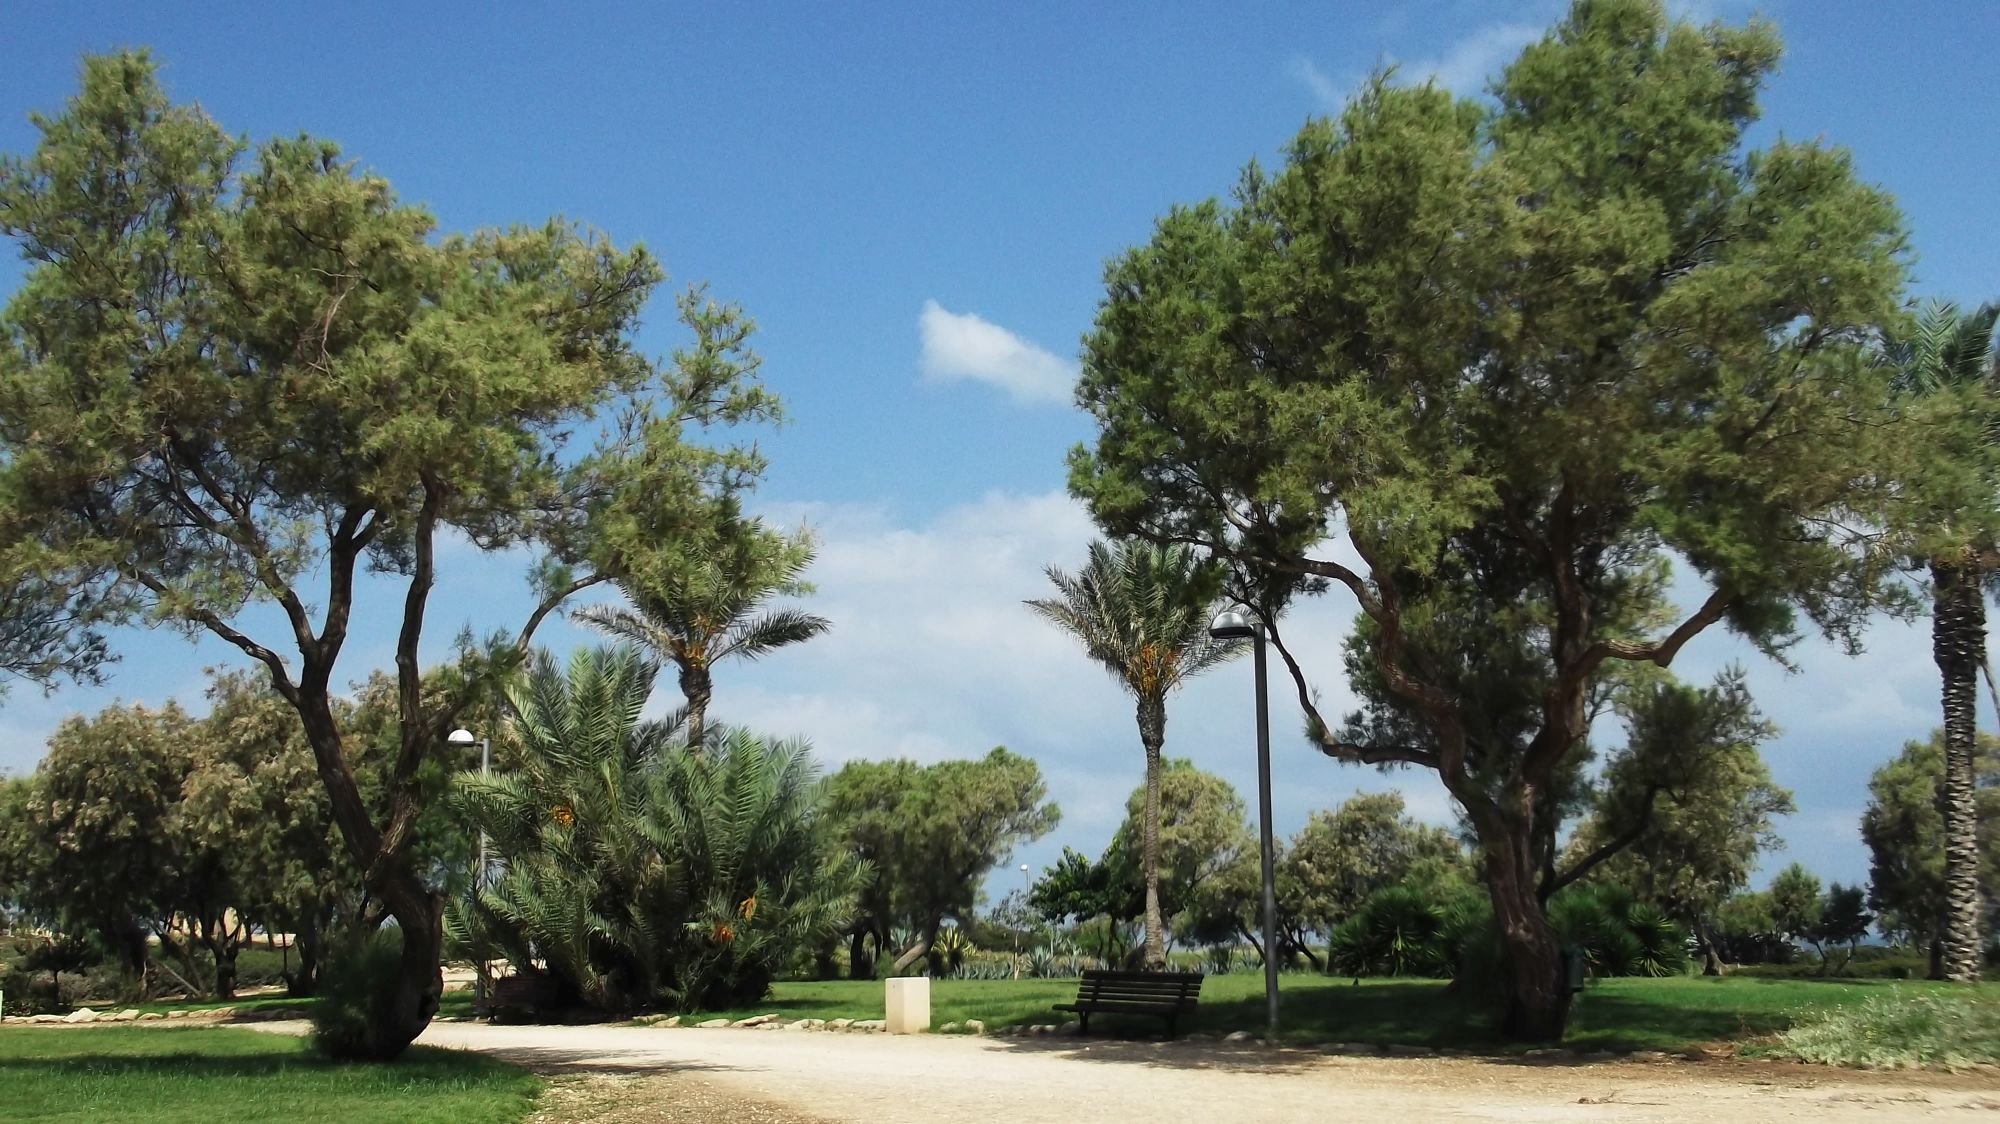 Izrael - Tel Aviv - zdjęcia, atrakcje